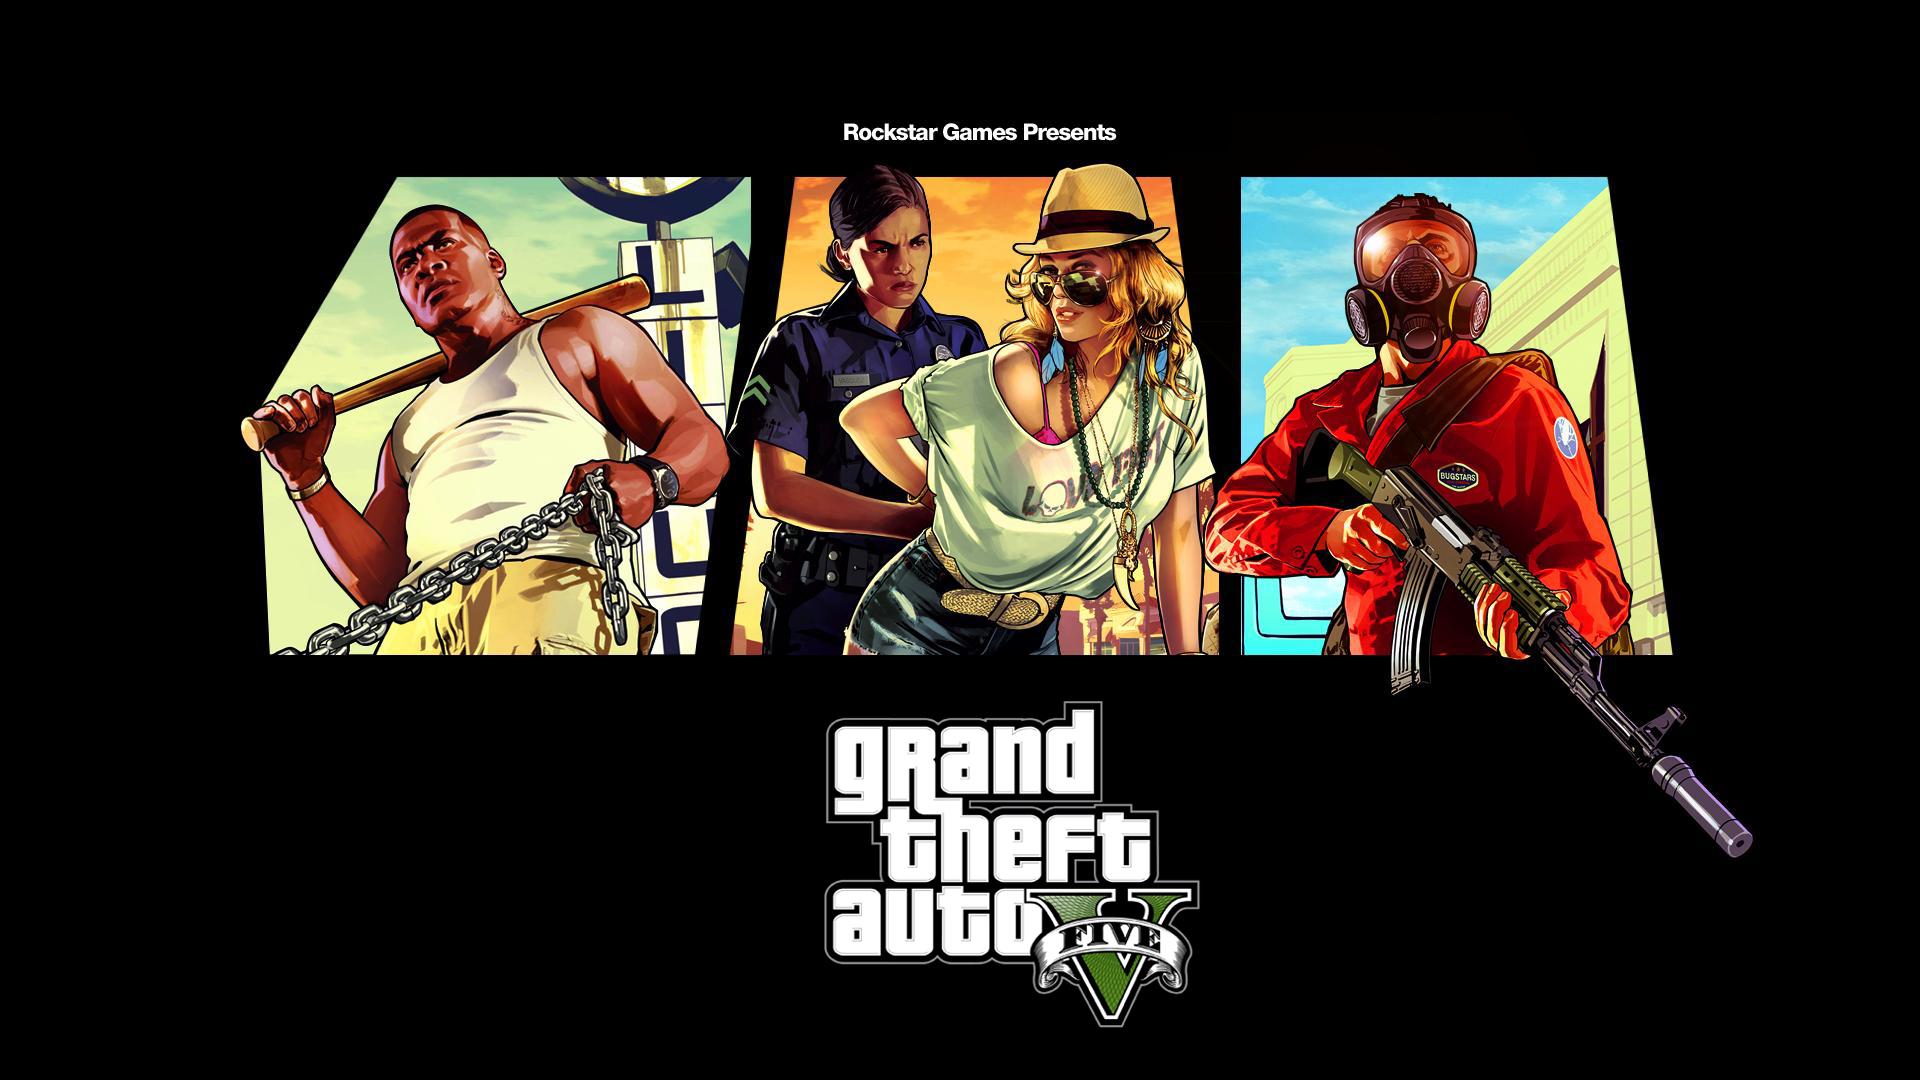 Grand Theft Auto V arrive